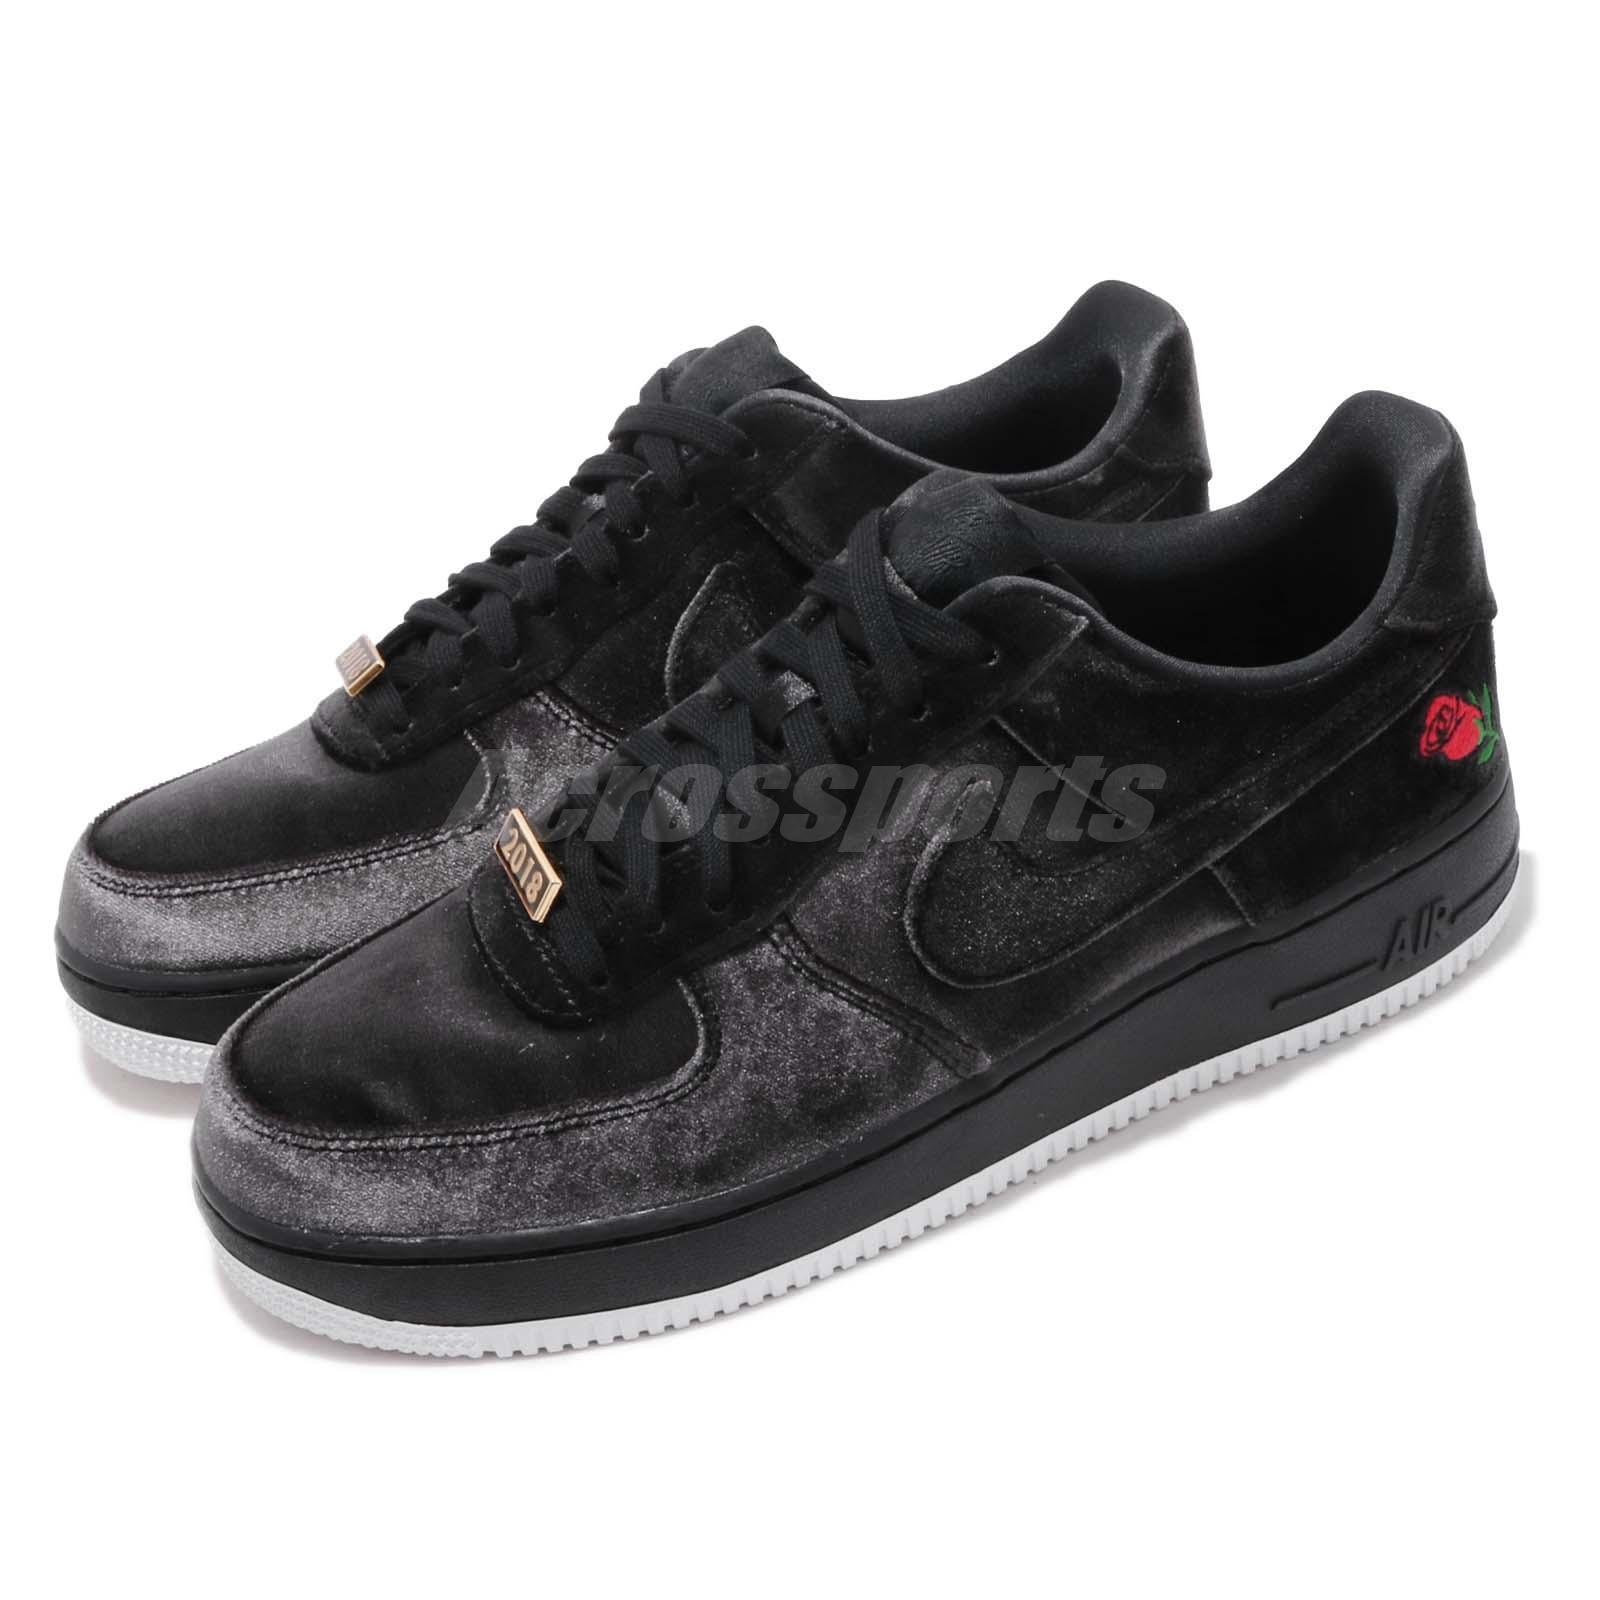 newest ada2a d2320 Details about Nike Air Force 1 07 QS Black Velvet Rose Mens AF1 Shoes  Sneakers AH8462-003